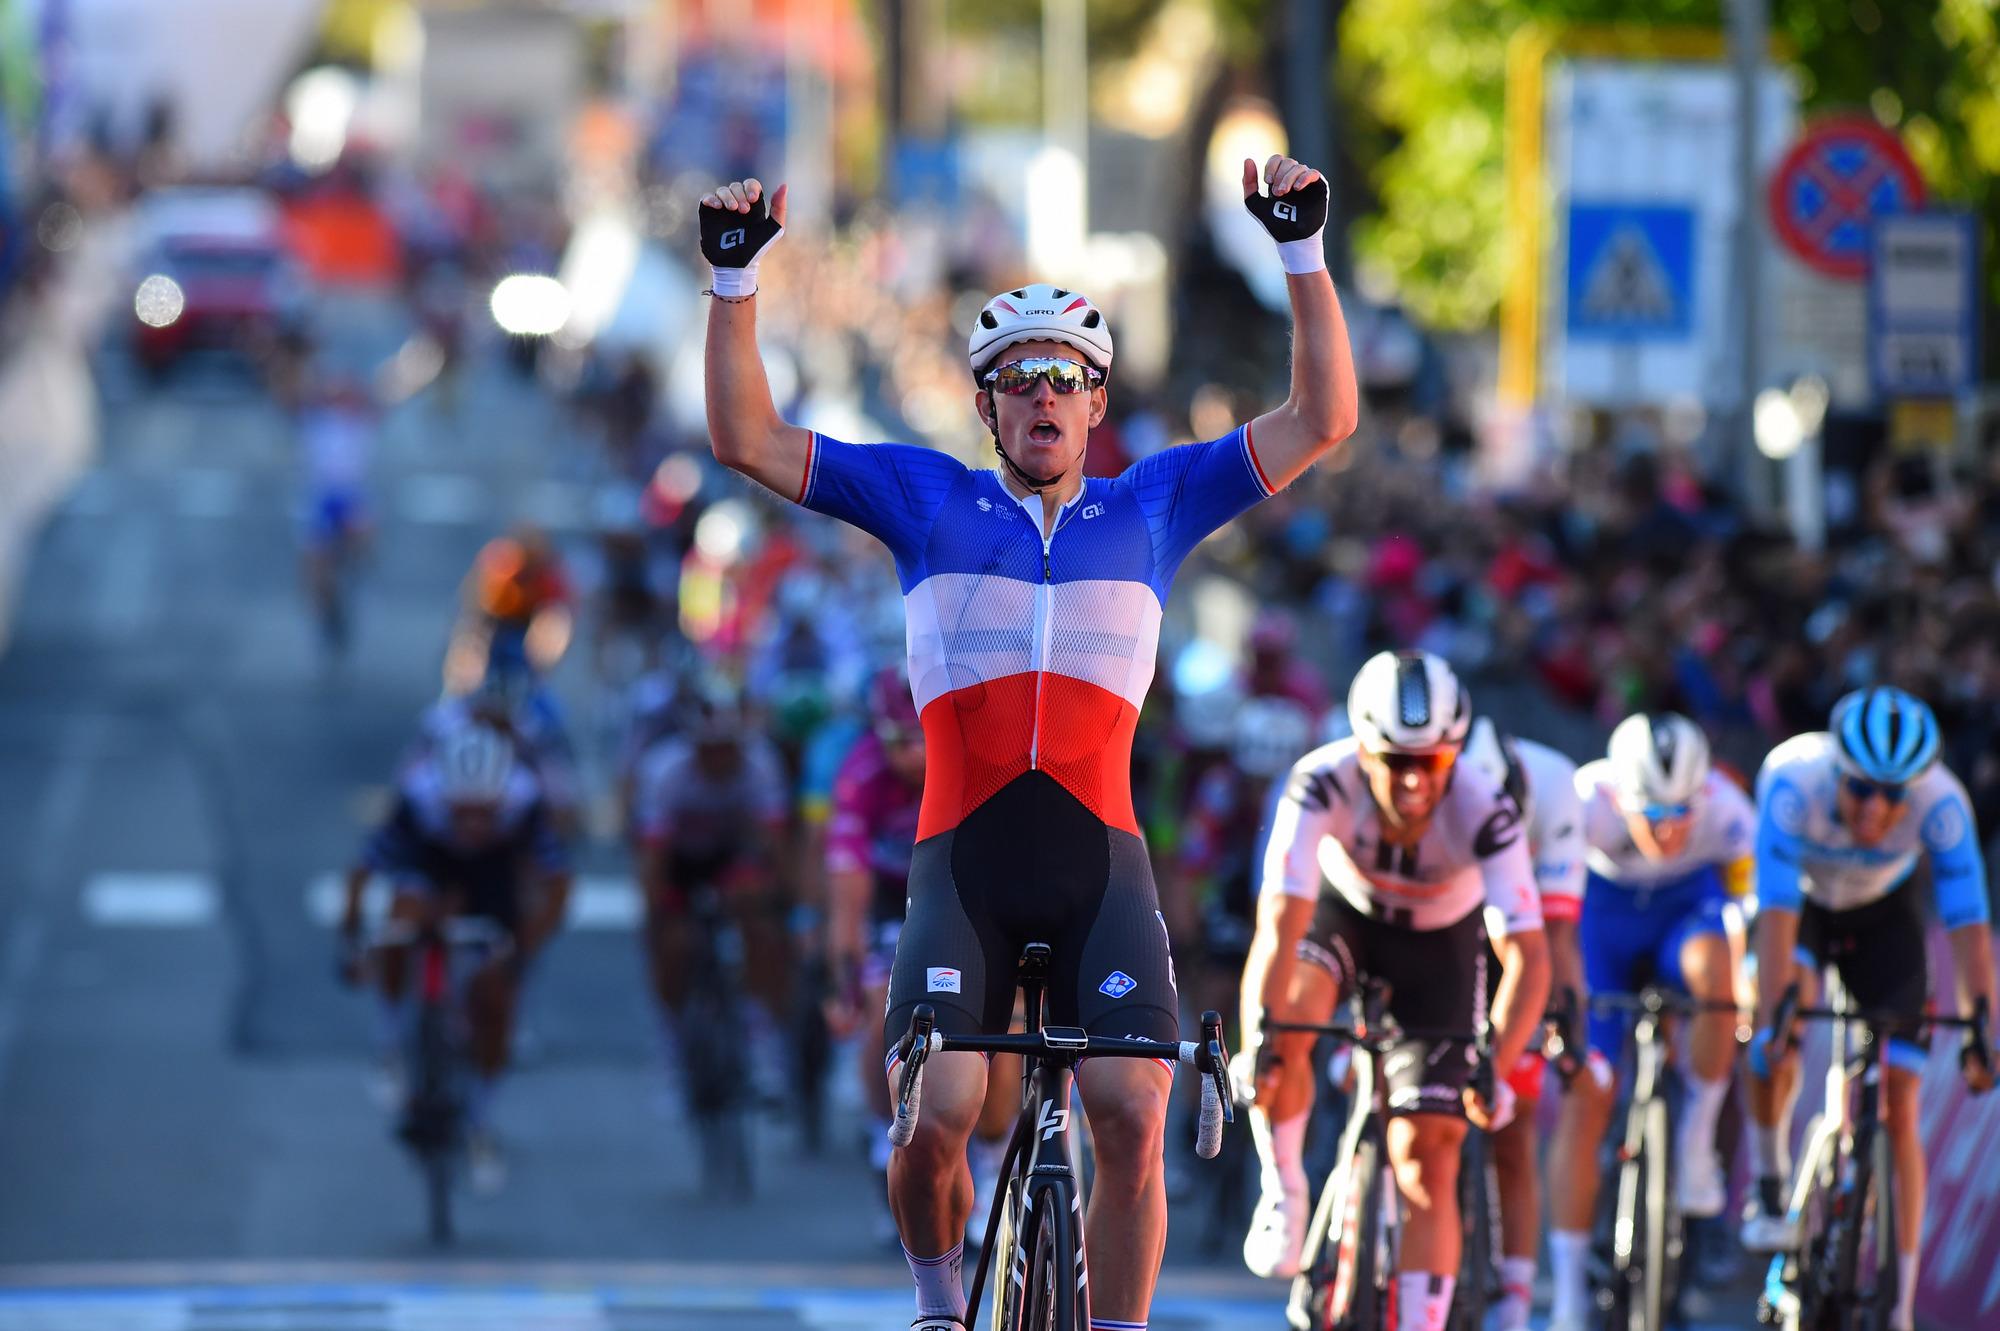 Giro dItalia 2020 103th Edition 6th stage Castrovillari Matera 188km 08102020 Arnaud Demare FRA Groupama FDJ photo Dario BelingheriBettiniPhoto2020